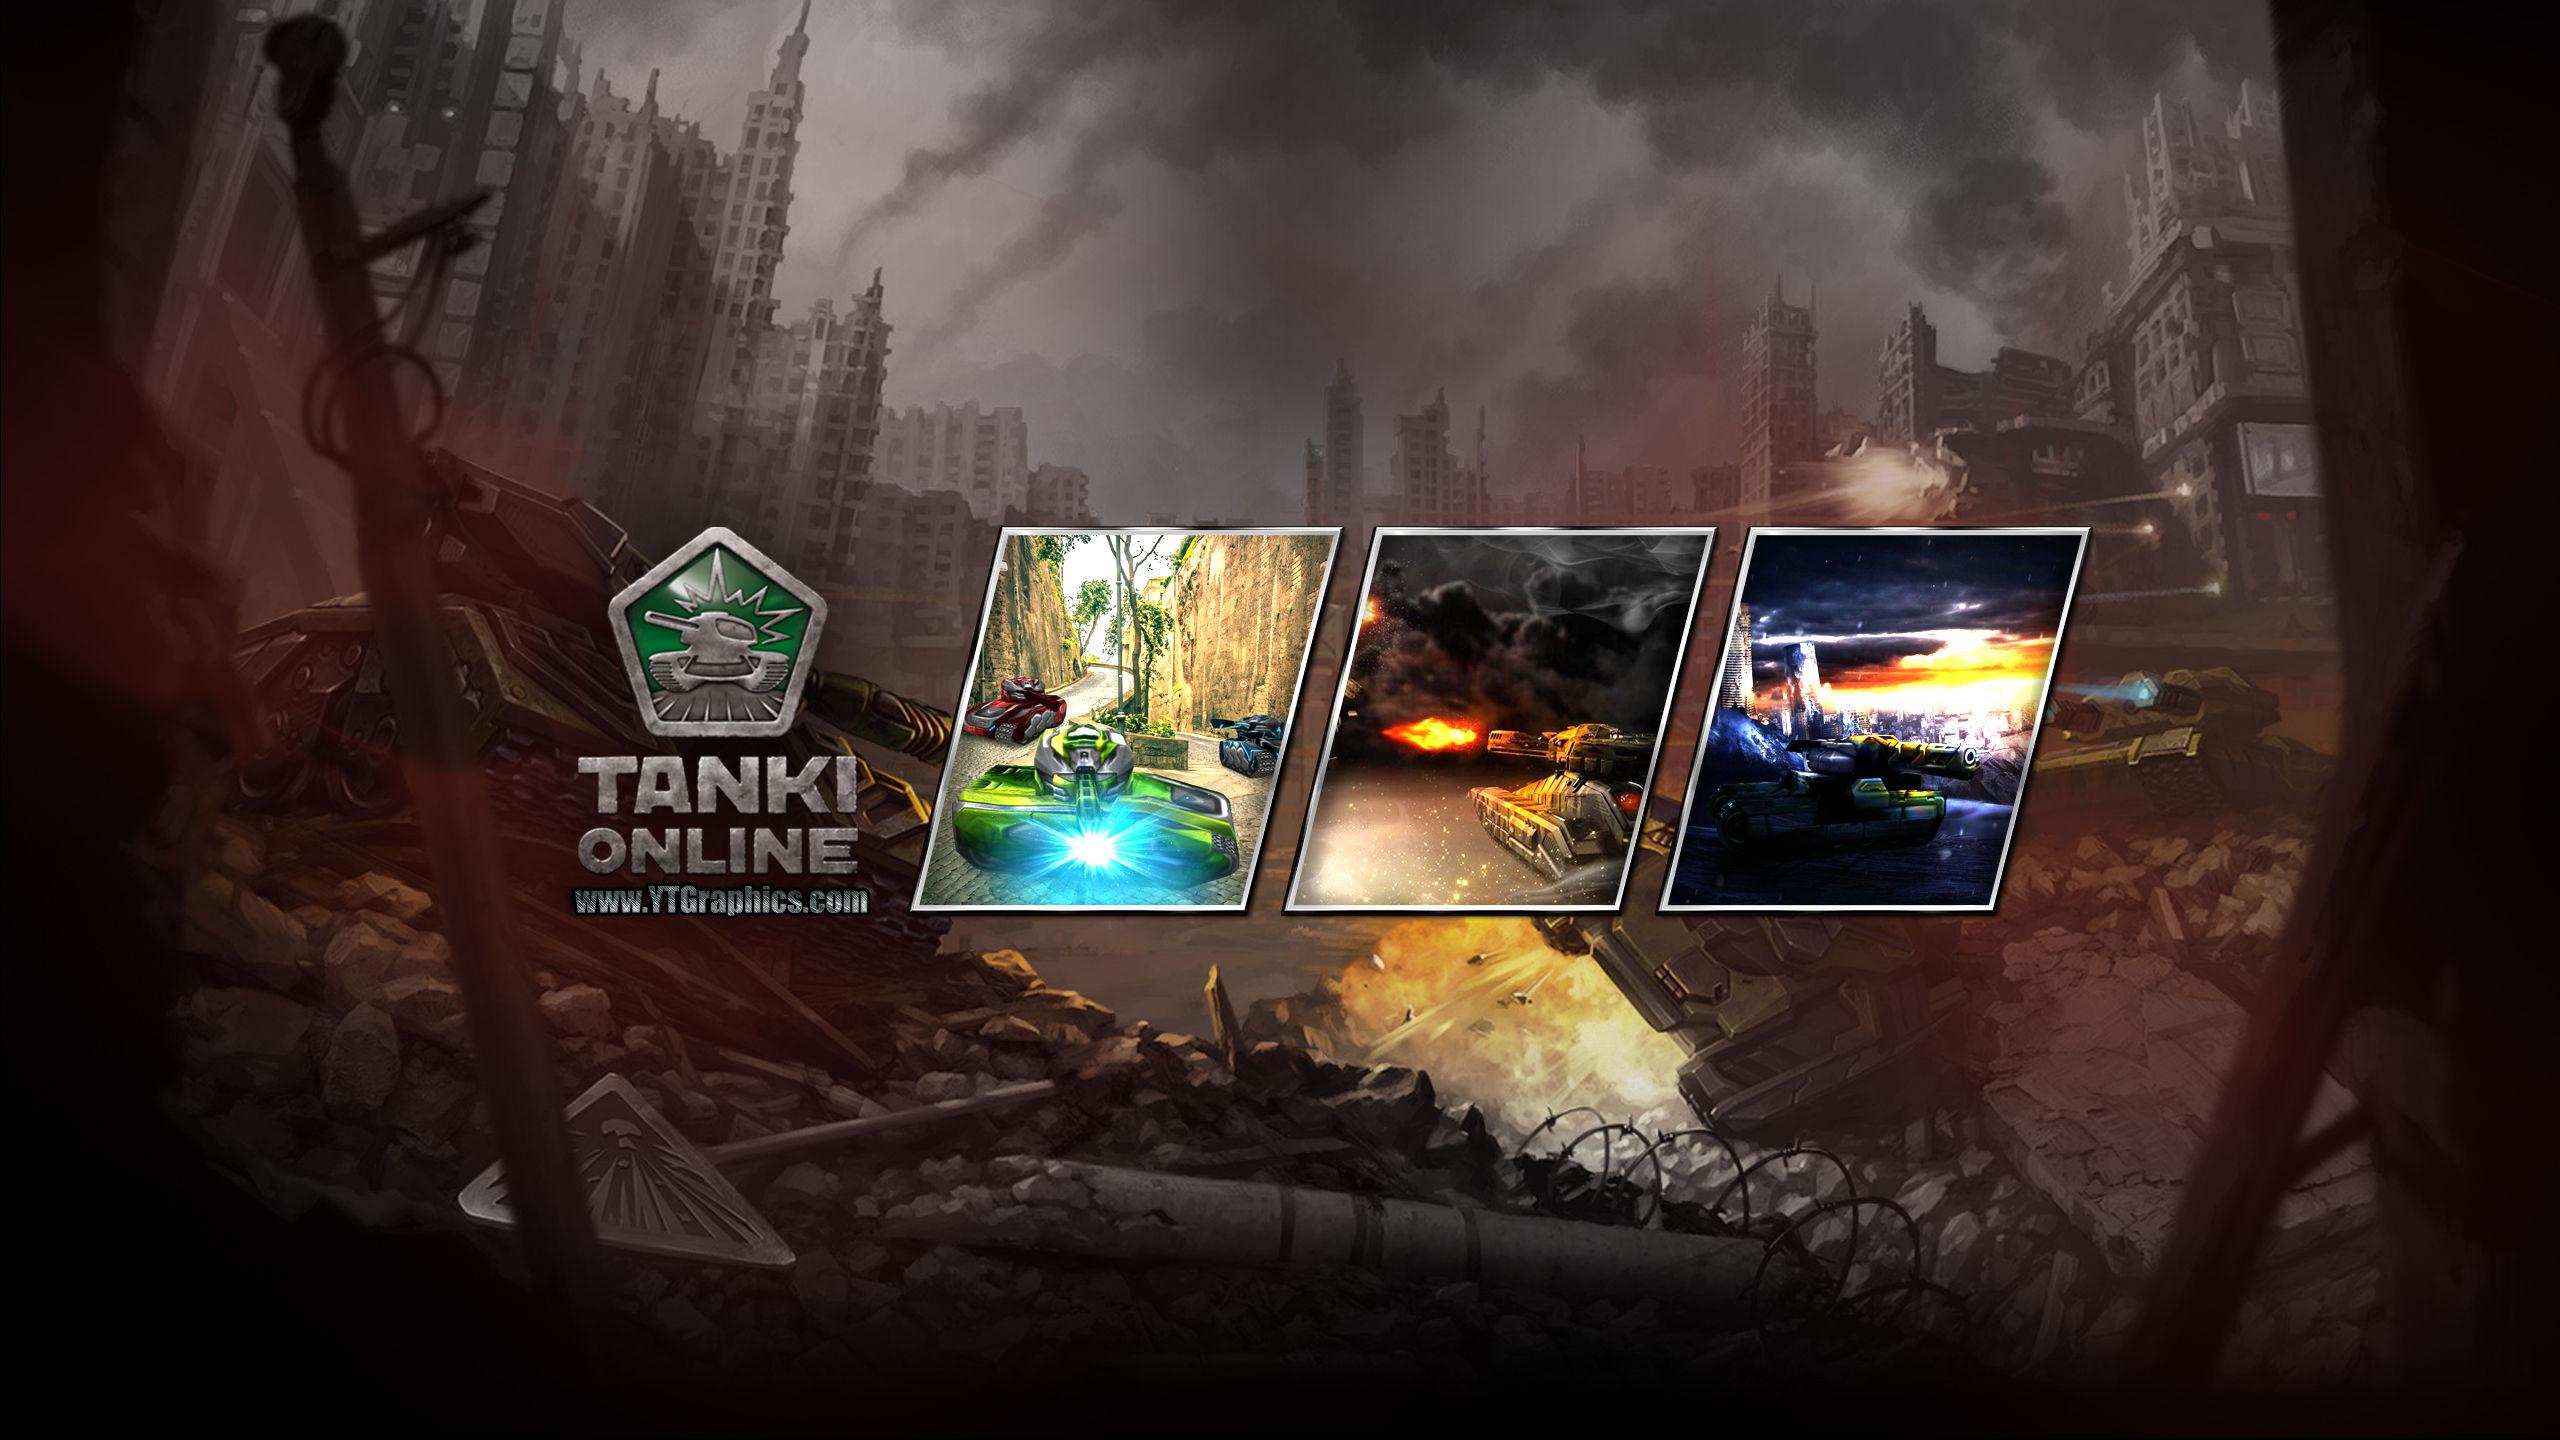 Tanki Online Youtube Channel Art Banner